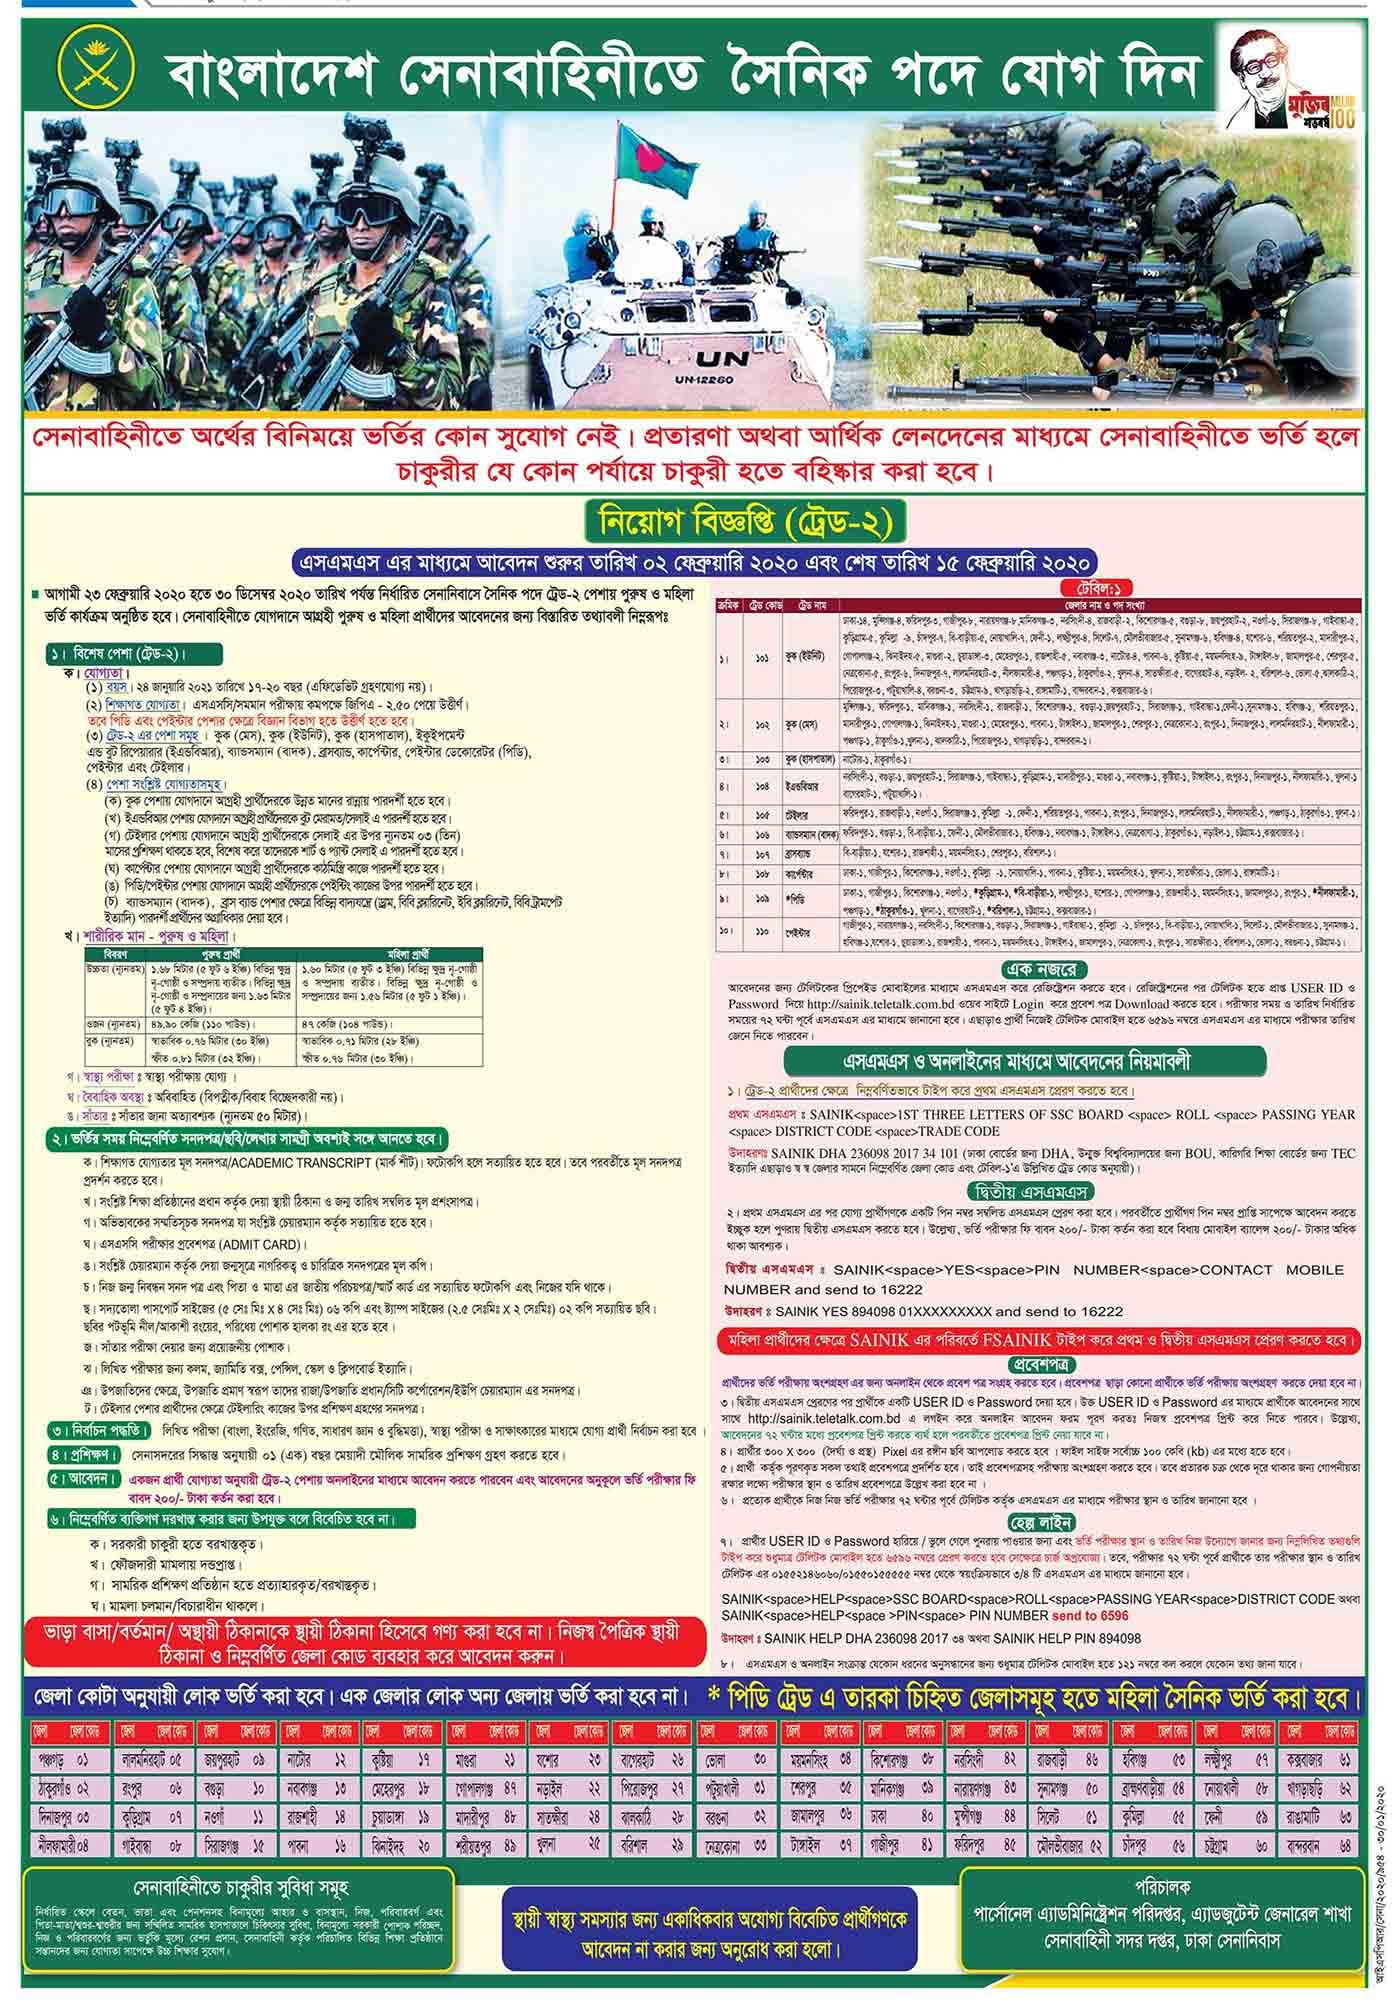 Bangladesh Army Job Circular 2020 2